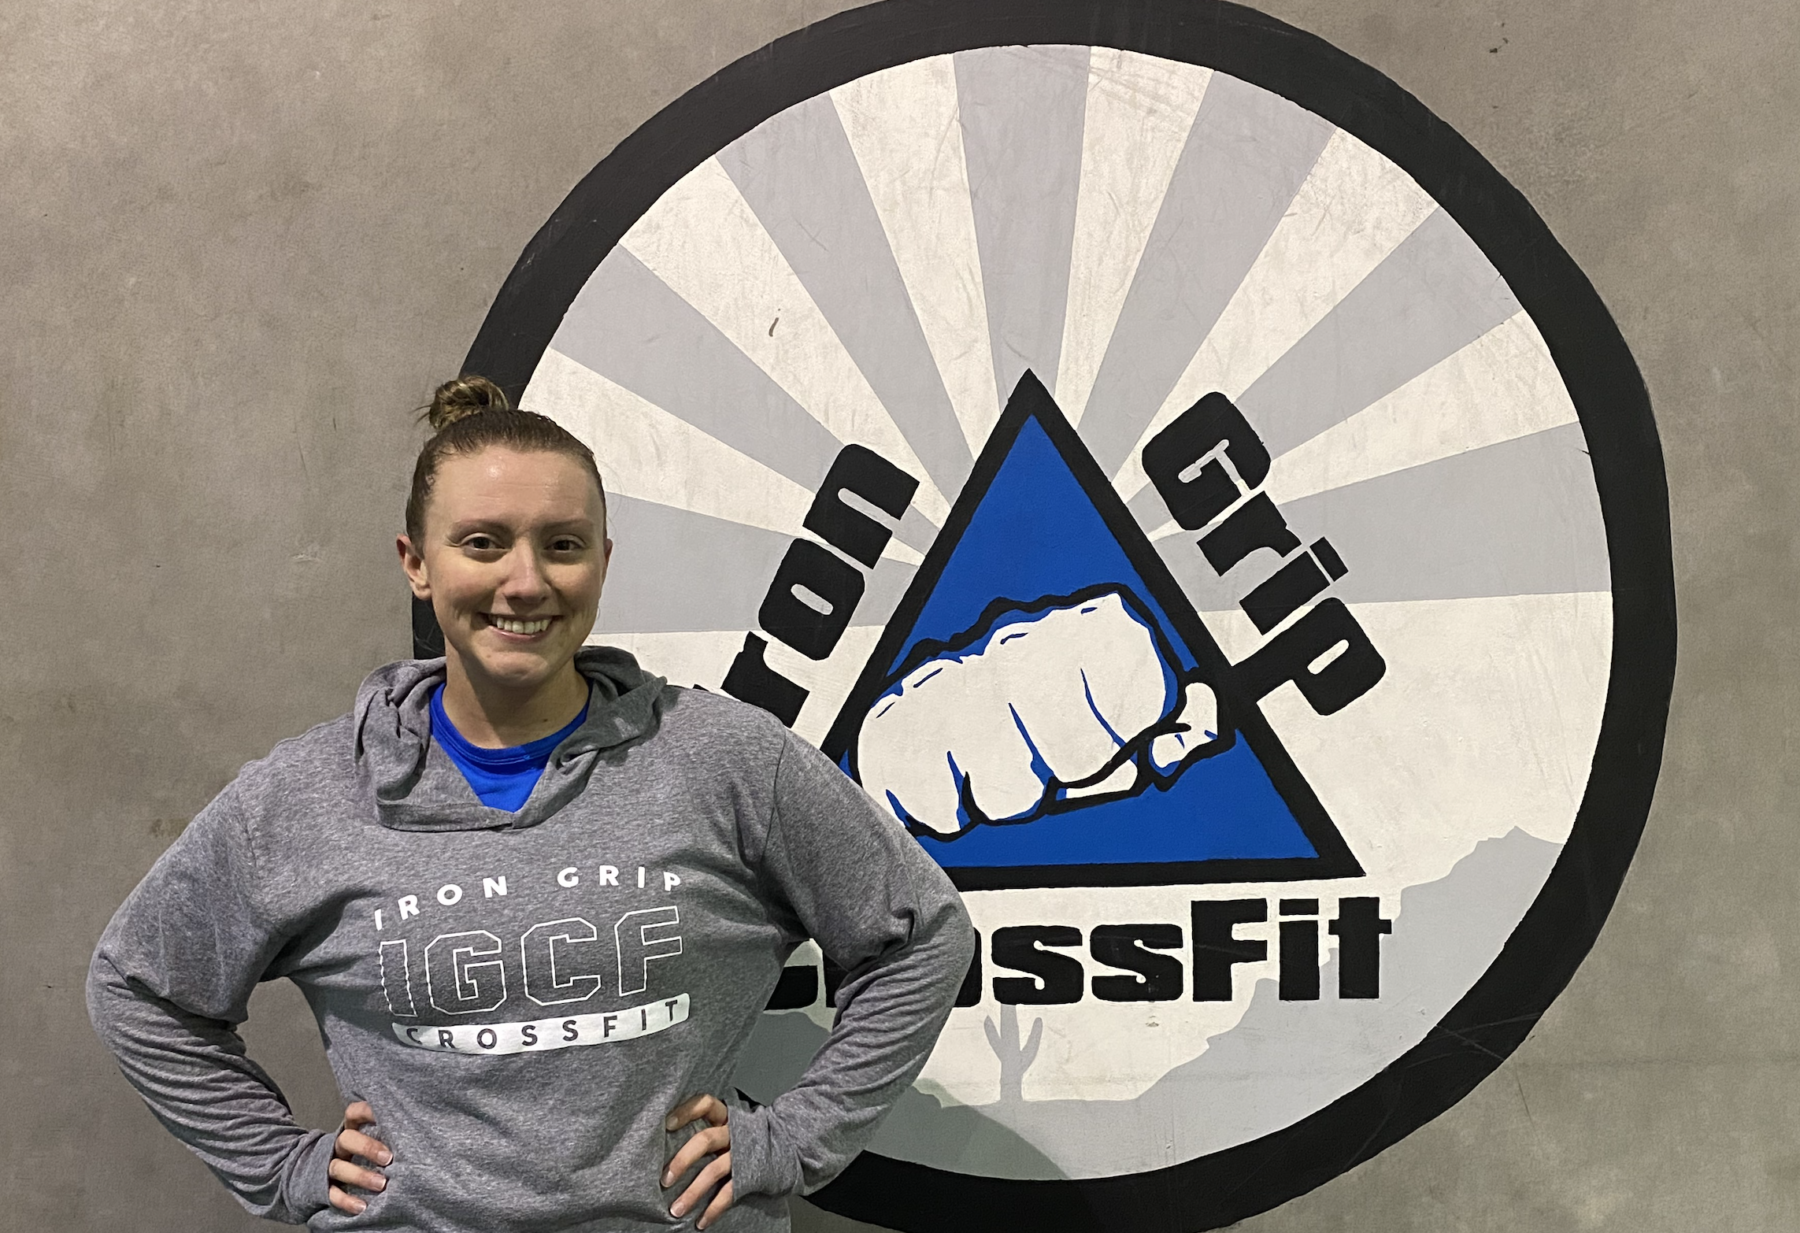 Samantha Armstrongs success story